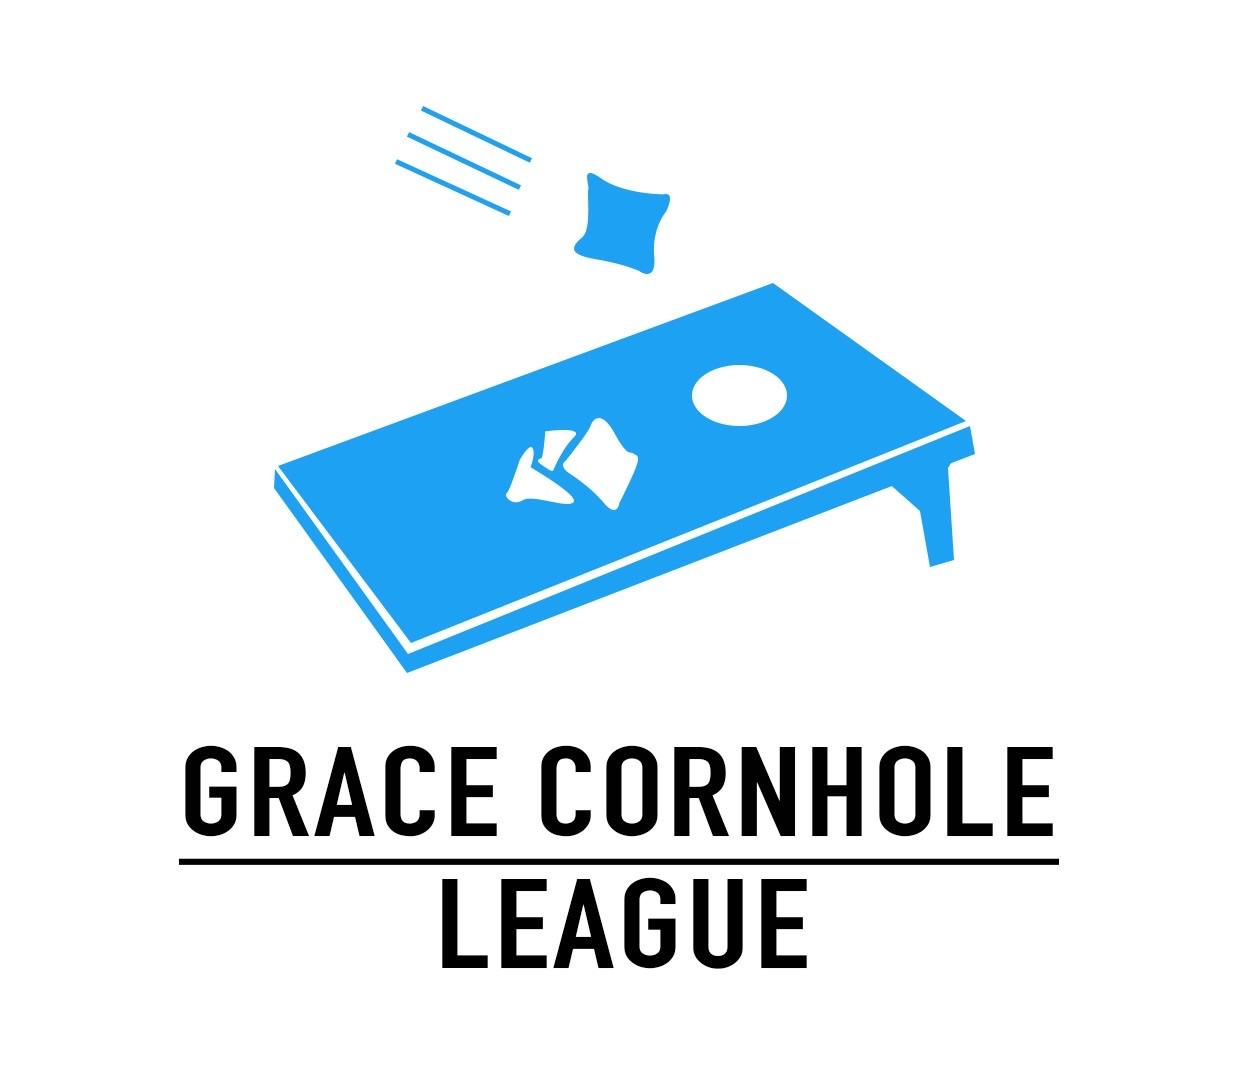 Grace Cornhole League Logo.jpg